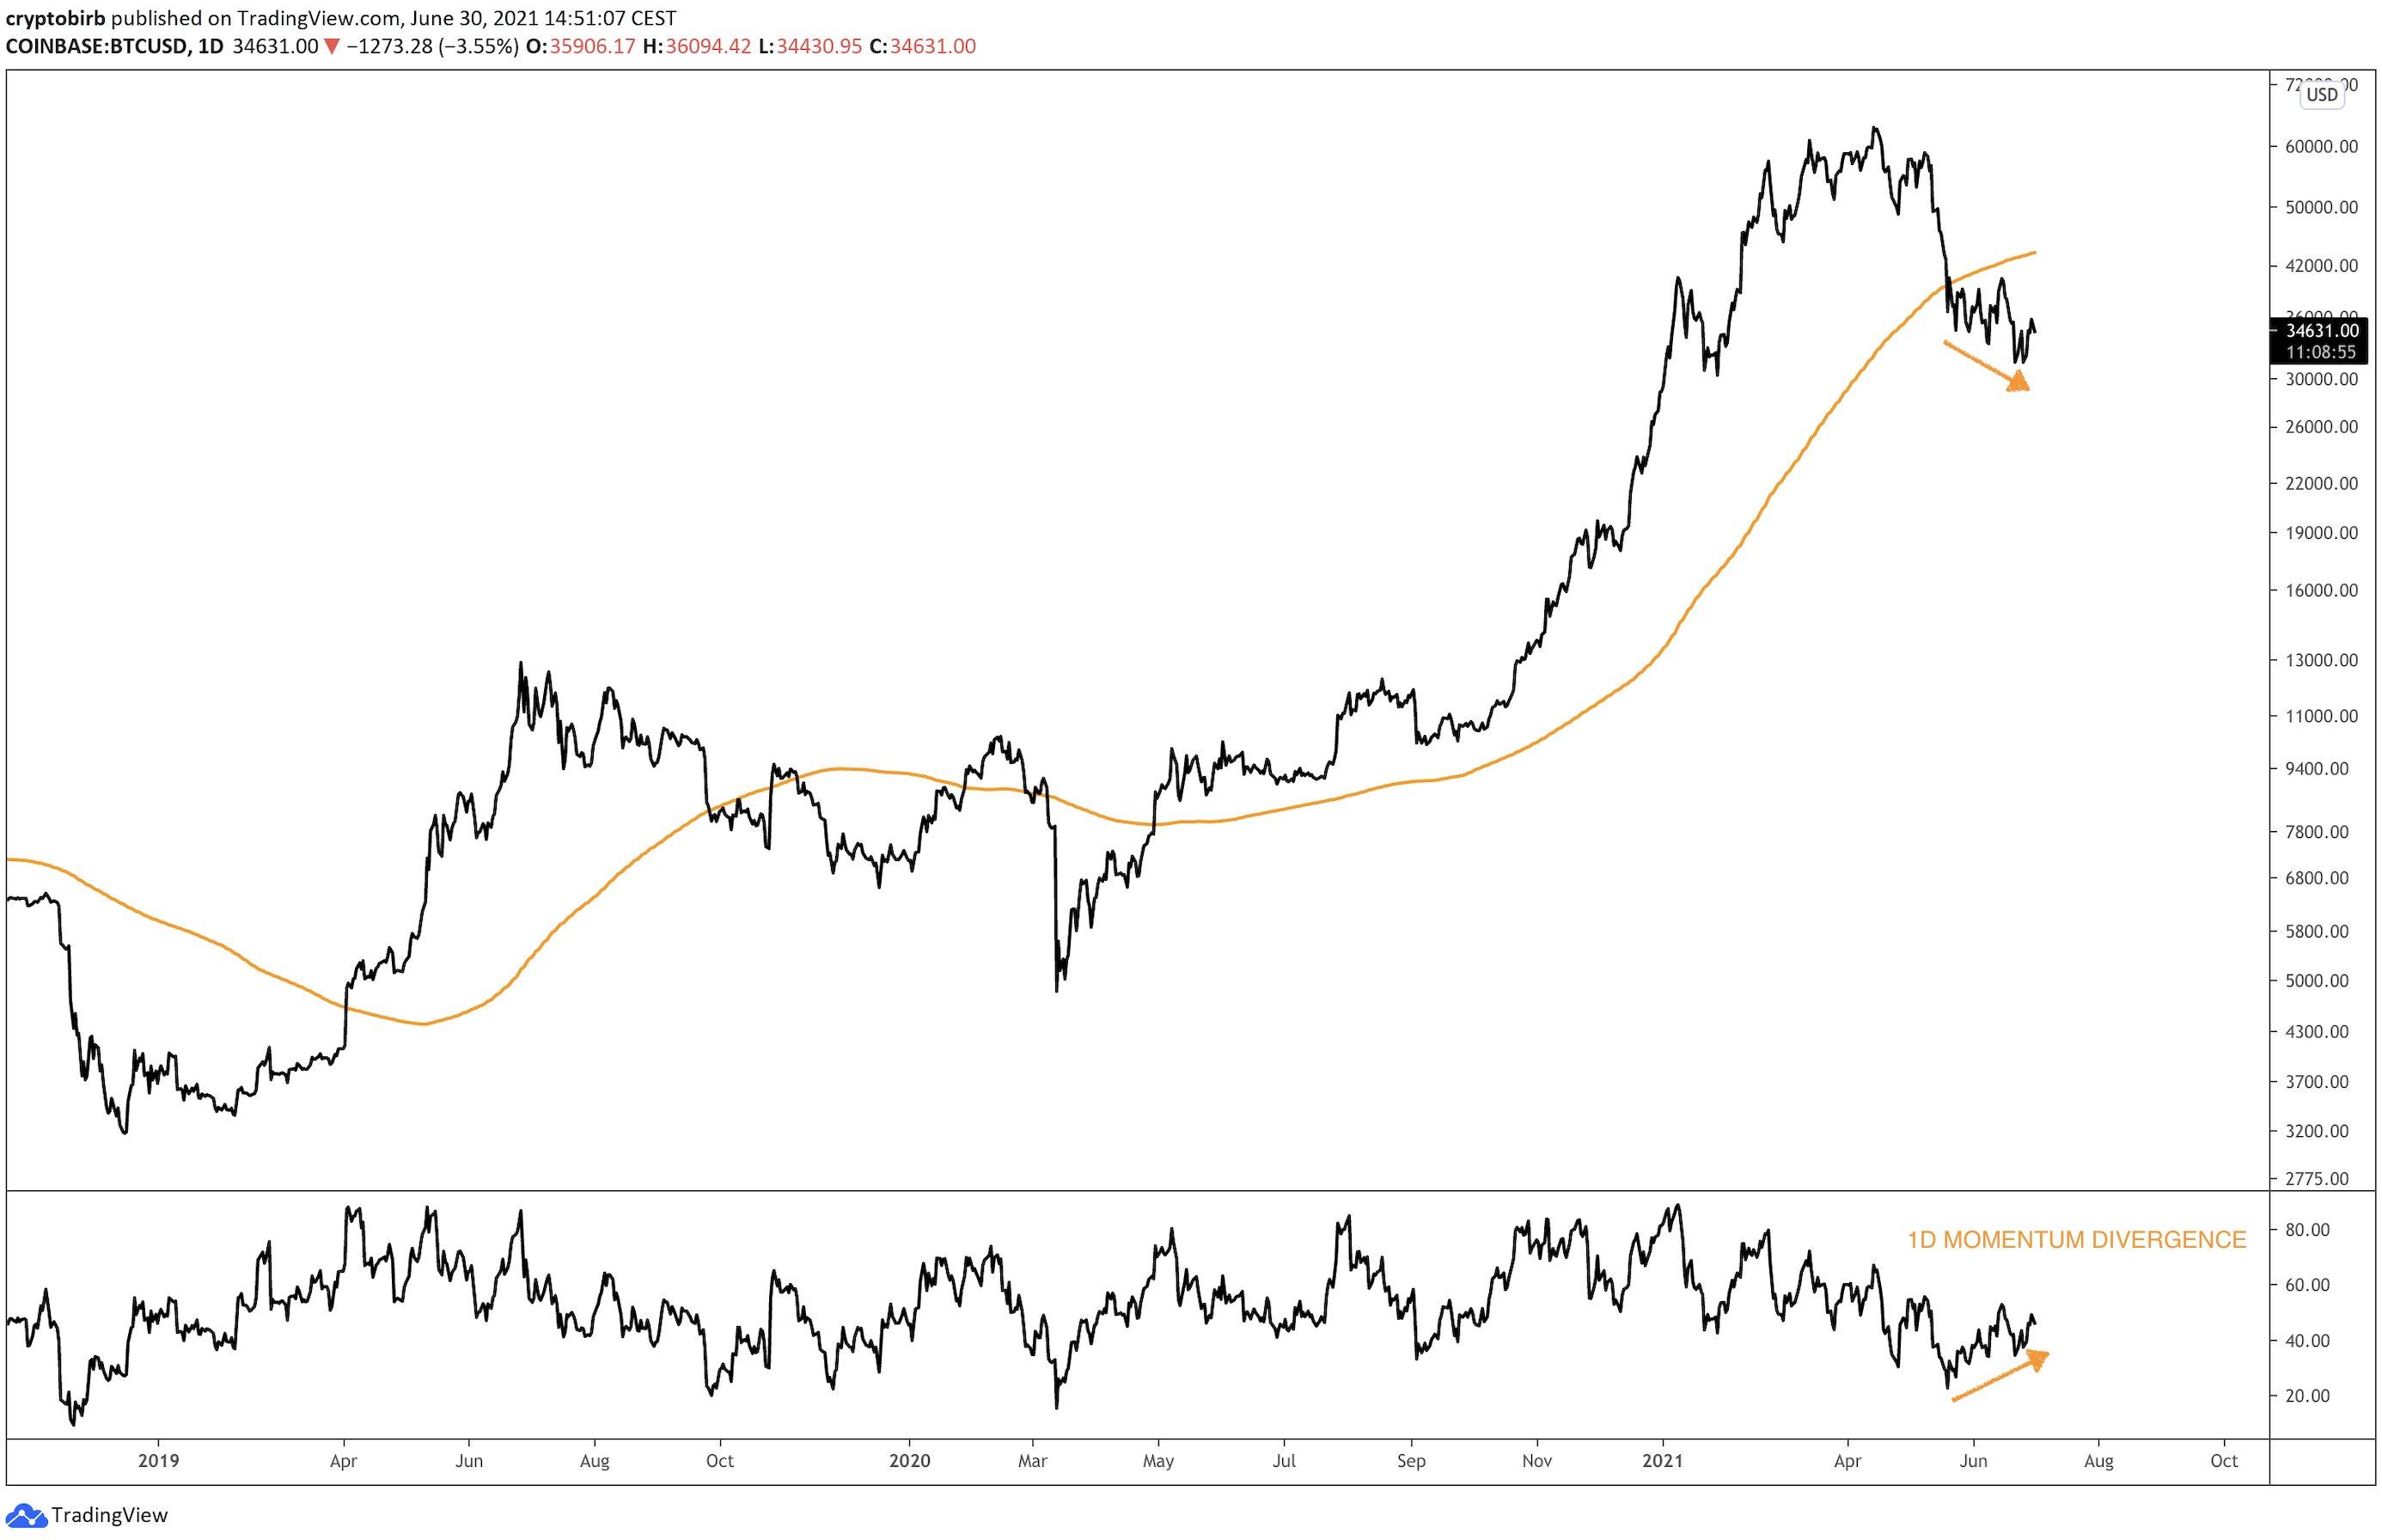 Bitcoin's key momentum metric hints at bullish divergence as BTC clings to K